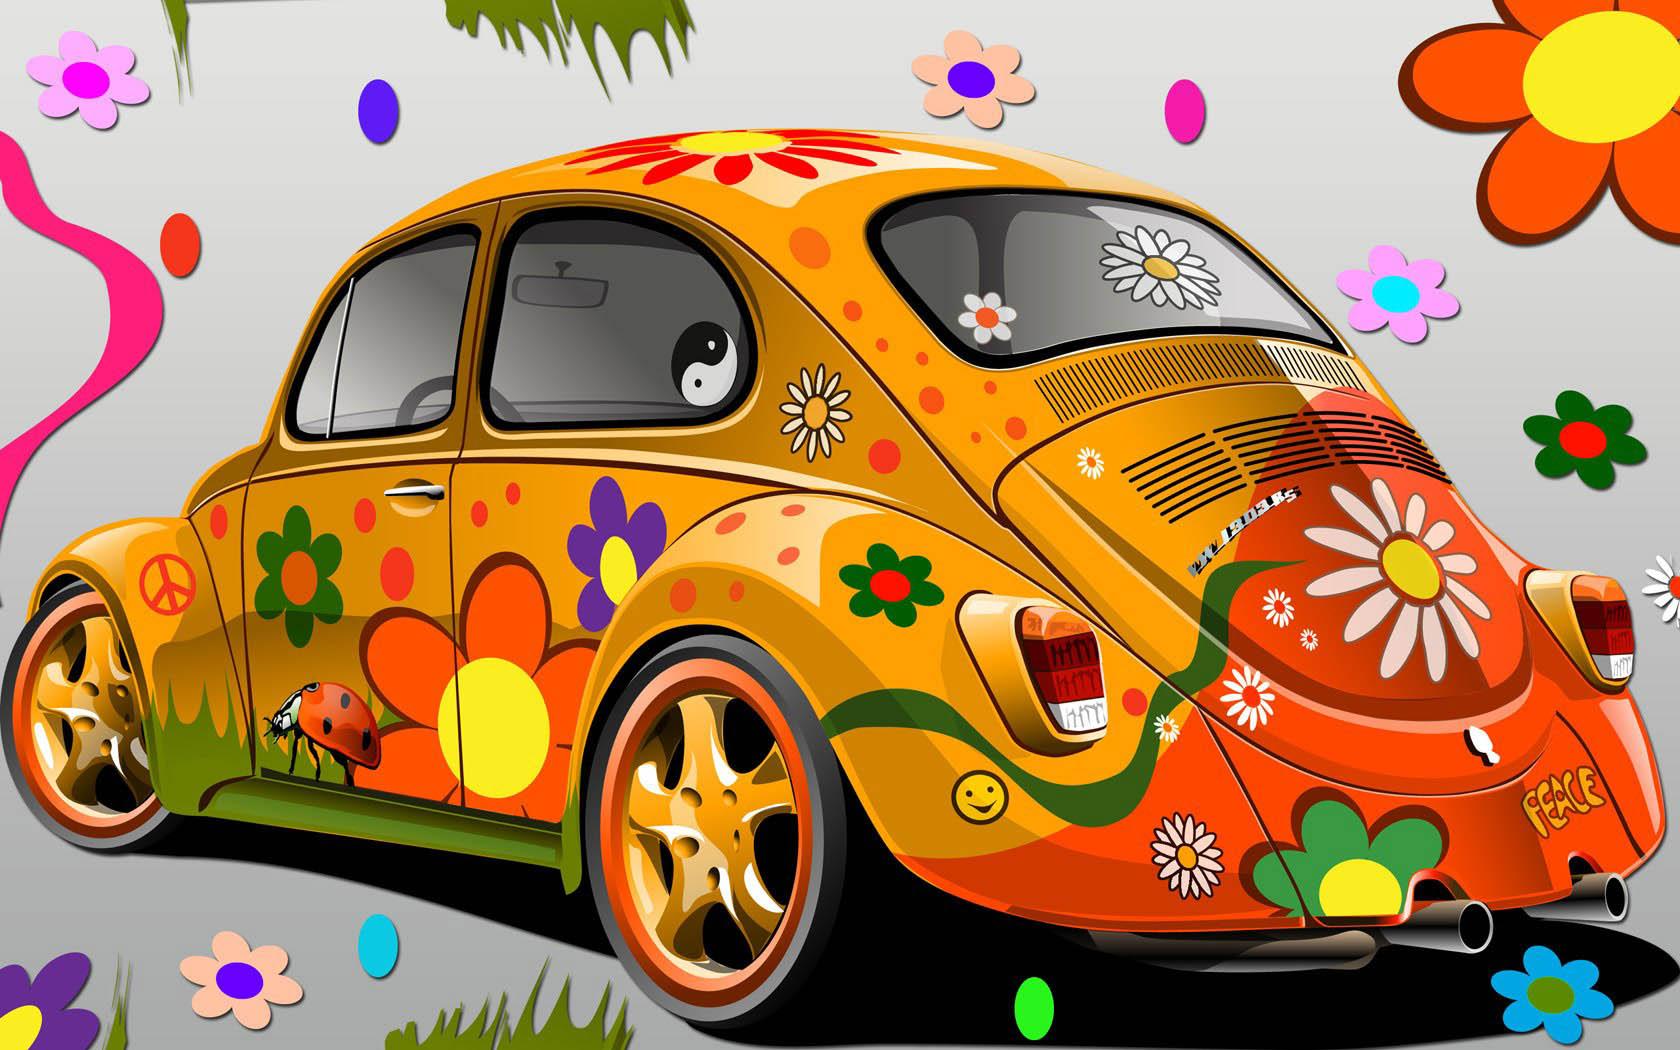 машина жук - Картинки 3D-Графика ...: pictar.ru/img-3d-kartinki-160-26005.htm